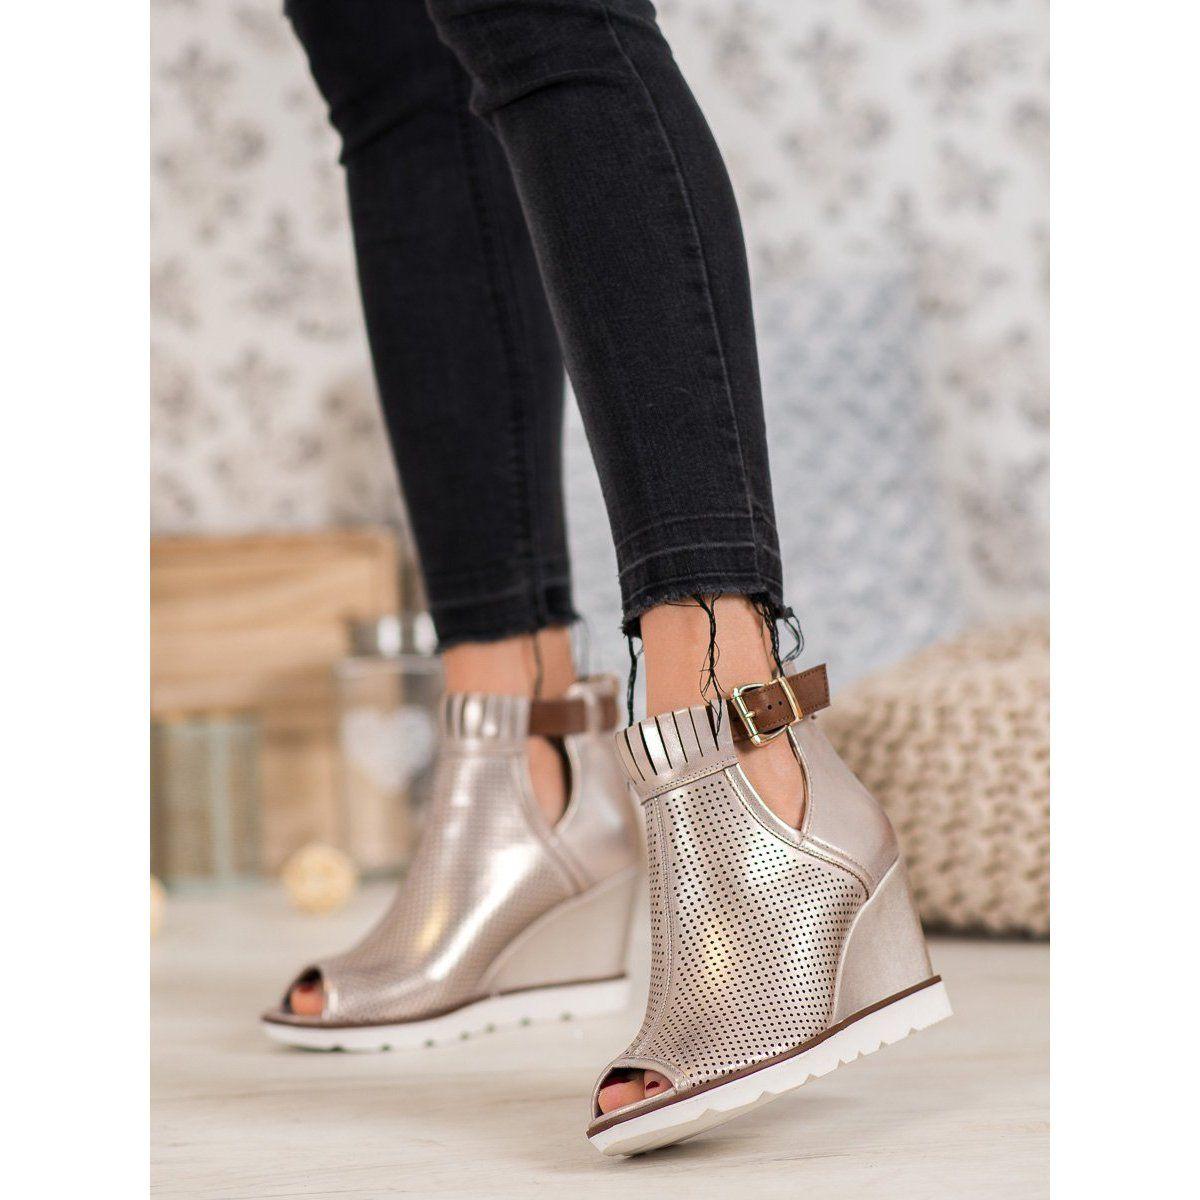 Filippo Zlote Botki Na Koturnie Zloty Chelsea Boots Ankle Boot Shoes